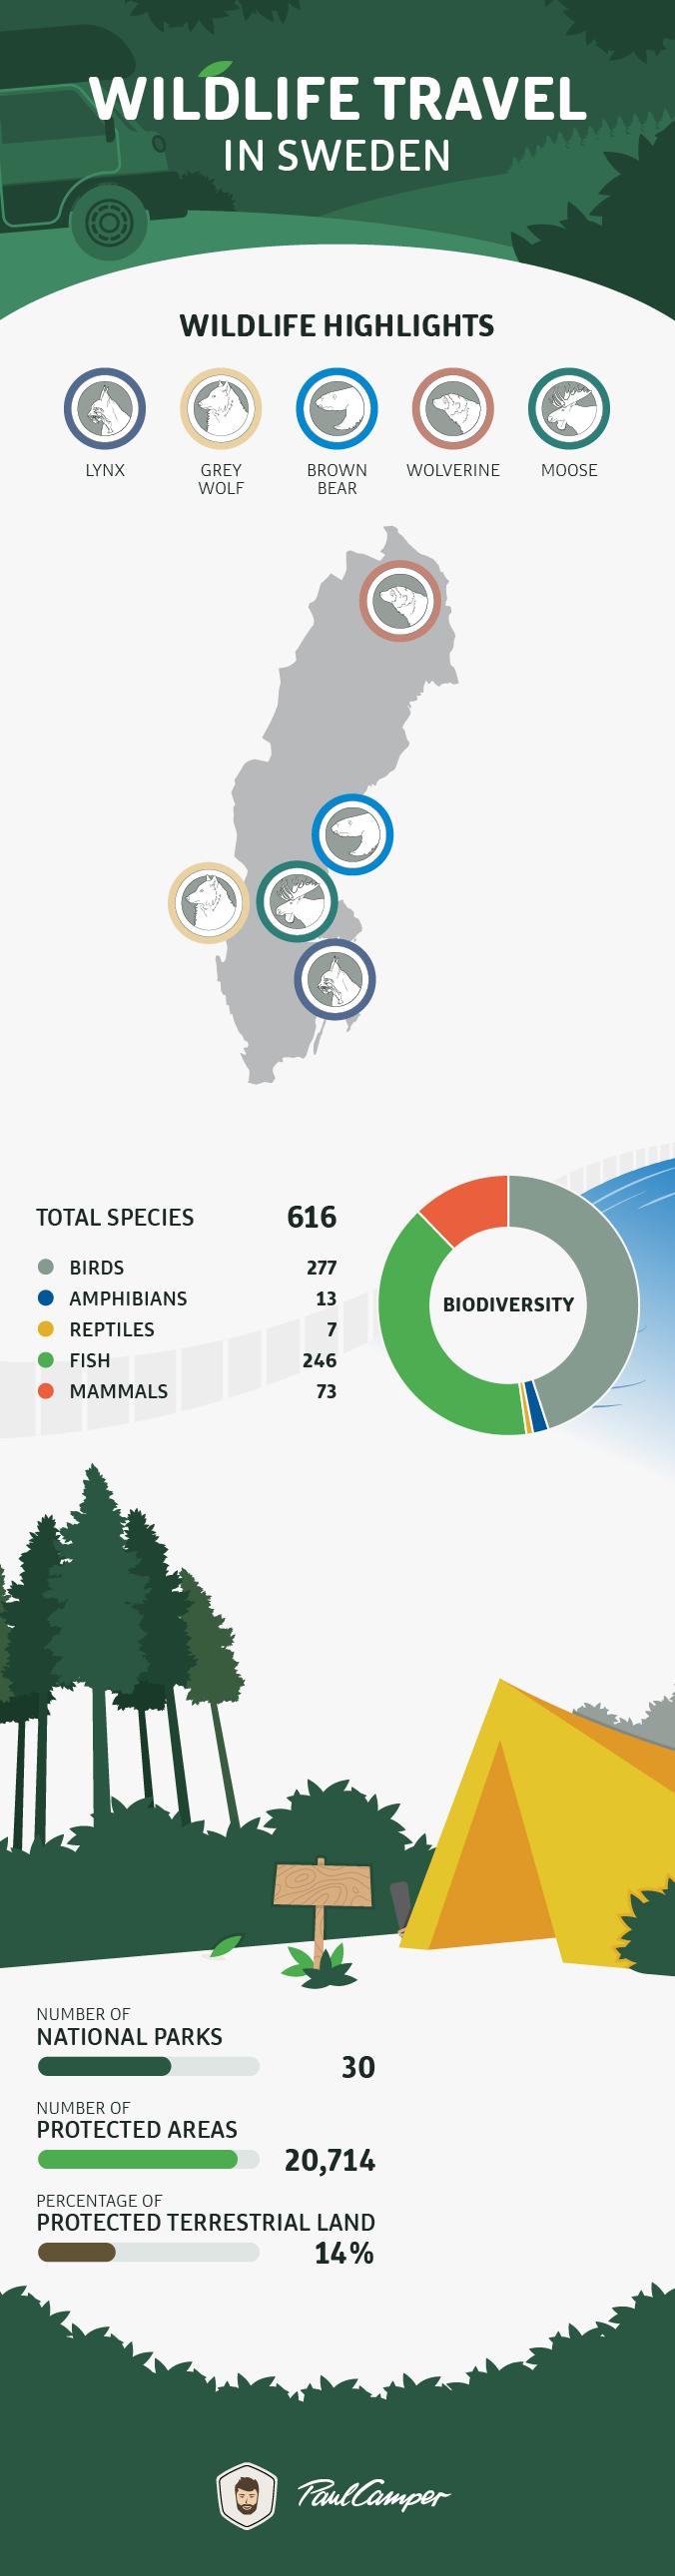 infographic wildlife sweden